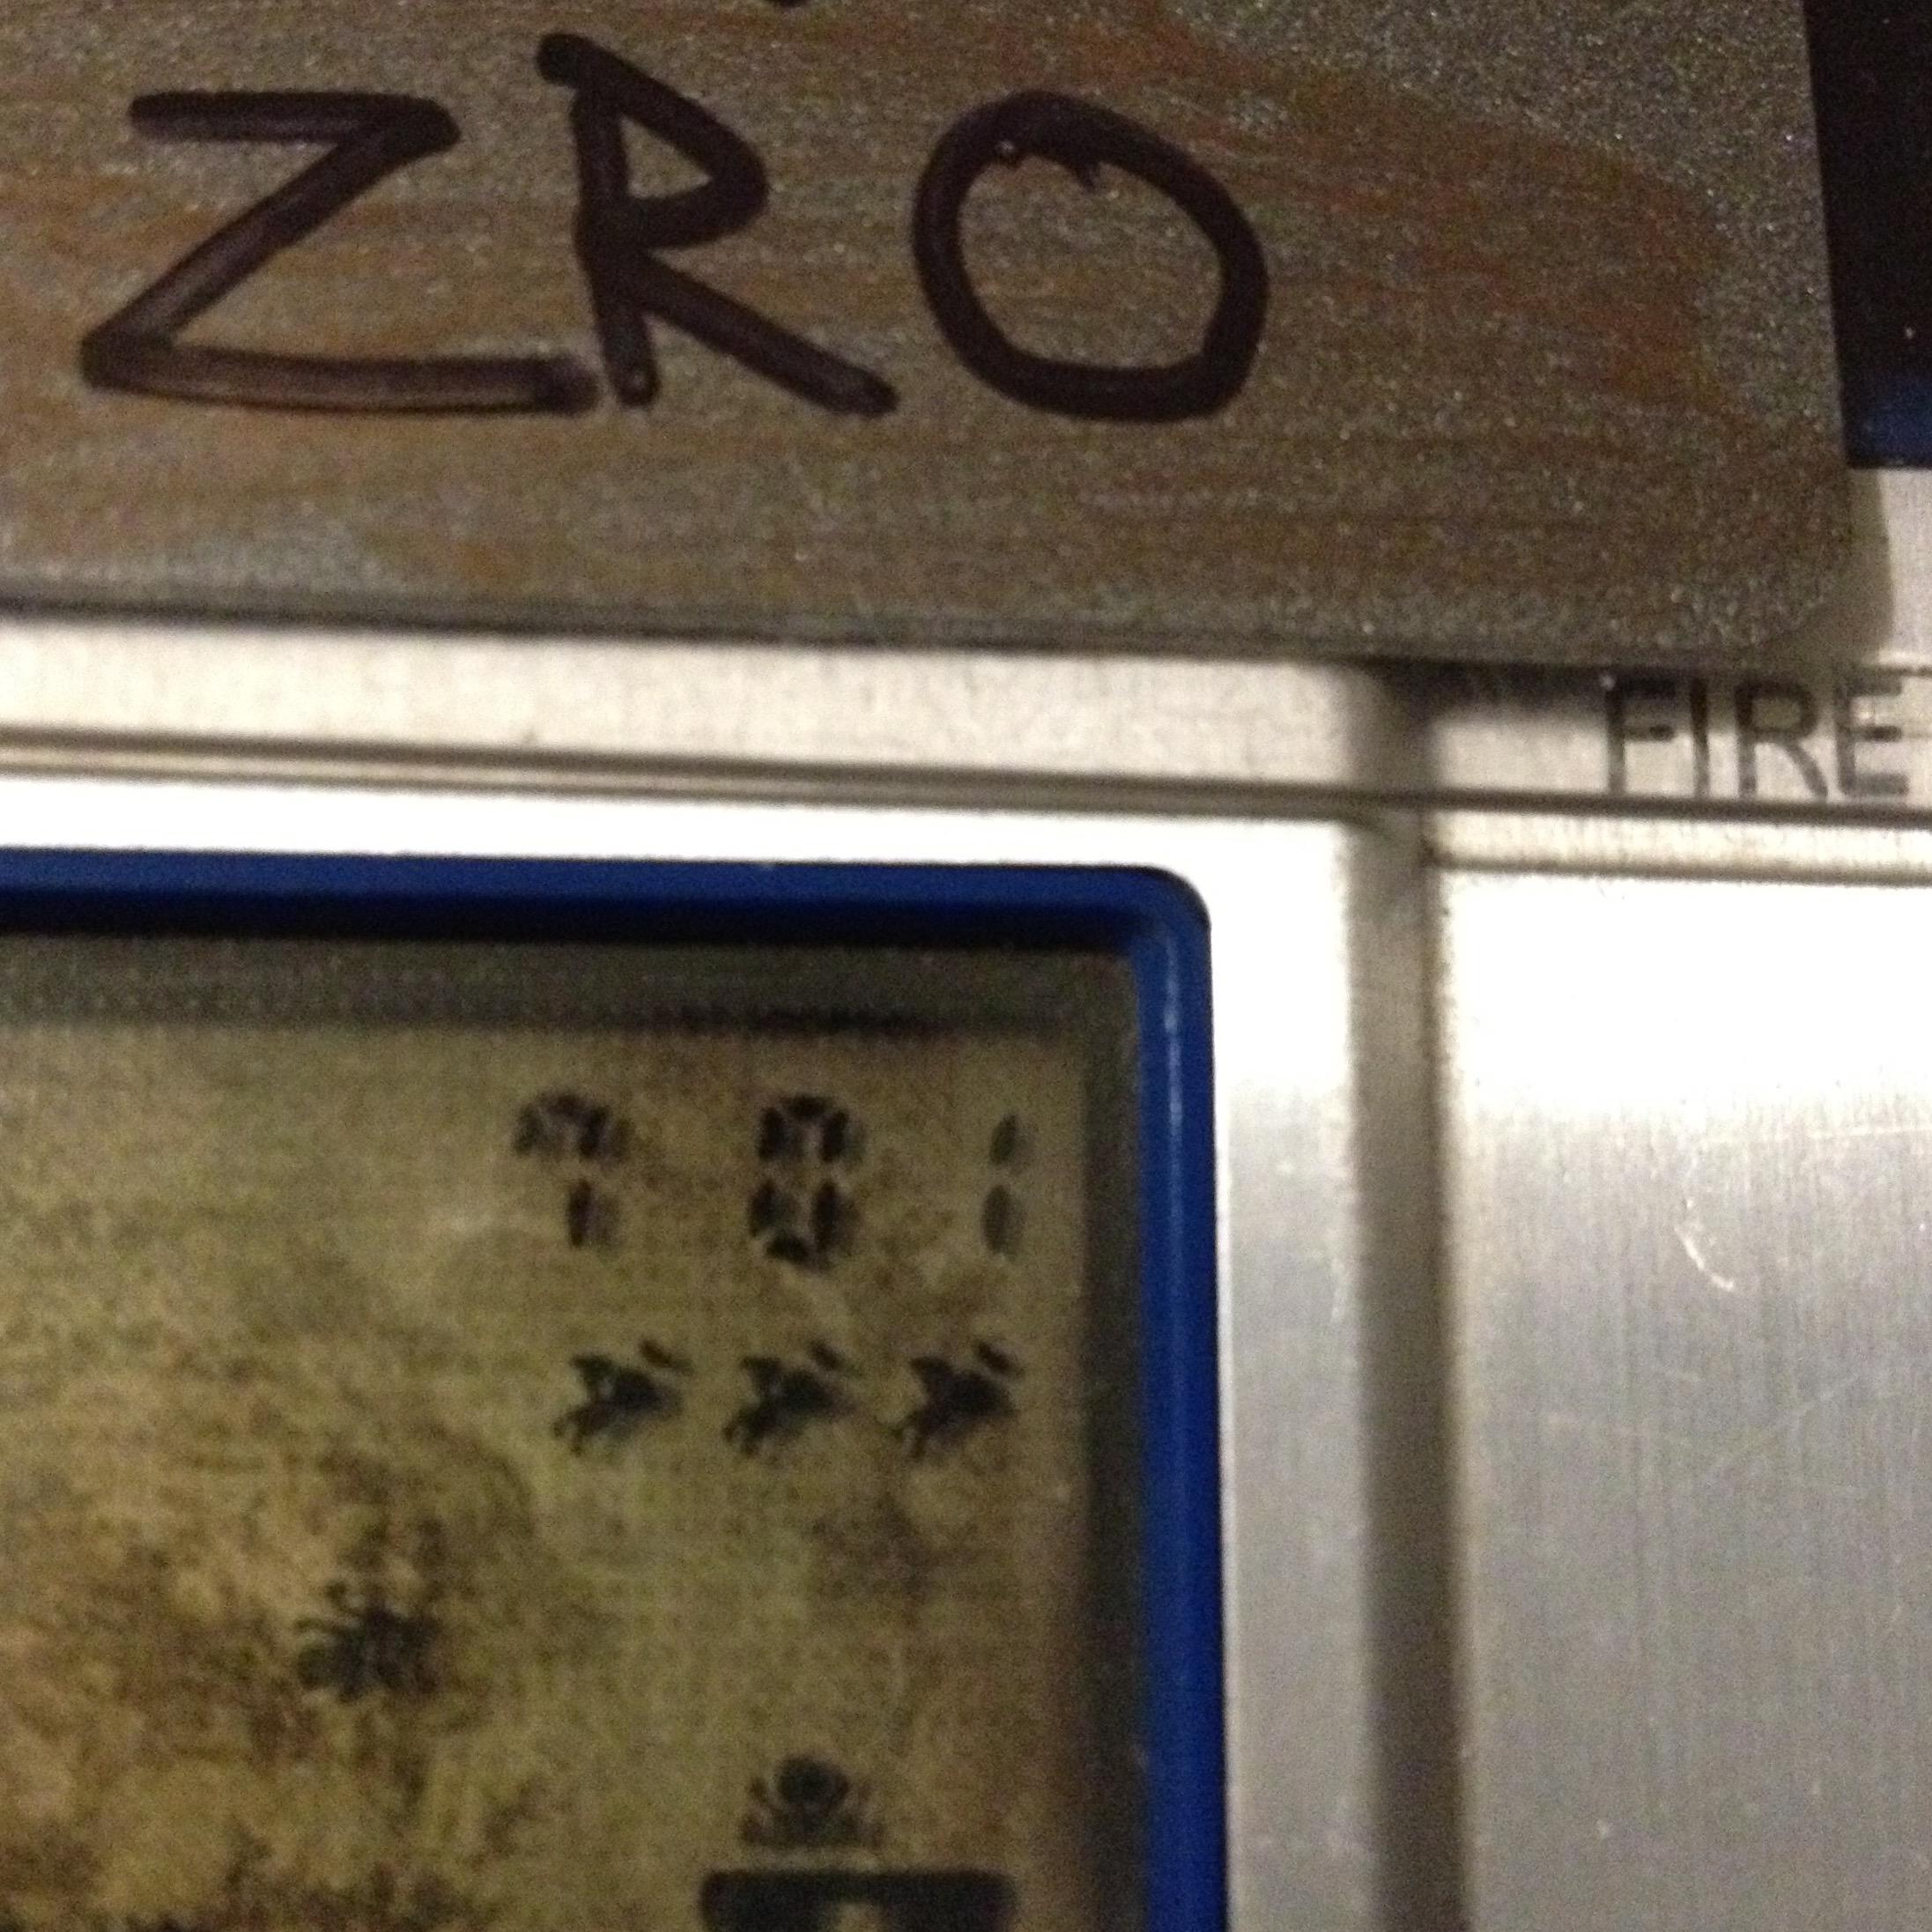 zerooskul: Game & Watch: Fire [aka Fireman Fireman] [Game A] (Dedicated Handheld) 701 points on 2019-07-28 20:31:19